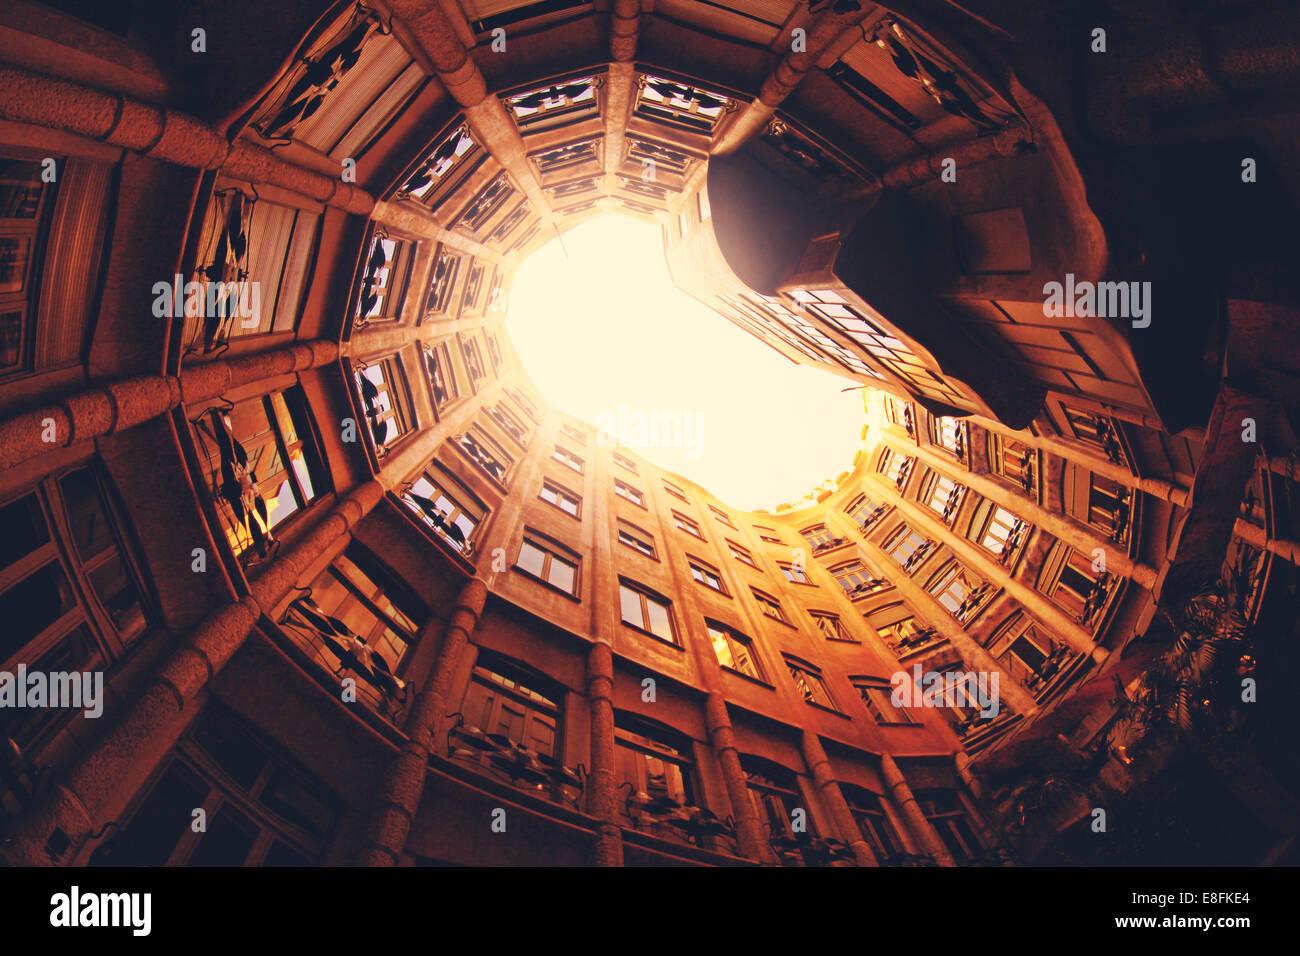 Spain, Barcelona, La Pedrera, Low angle view of building - Stock Image